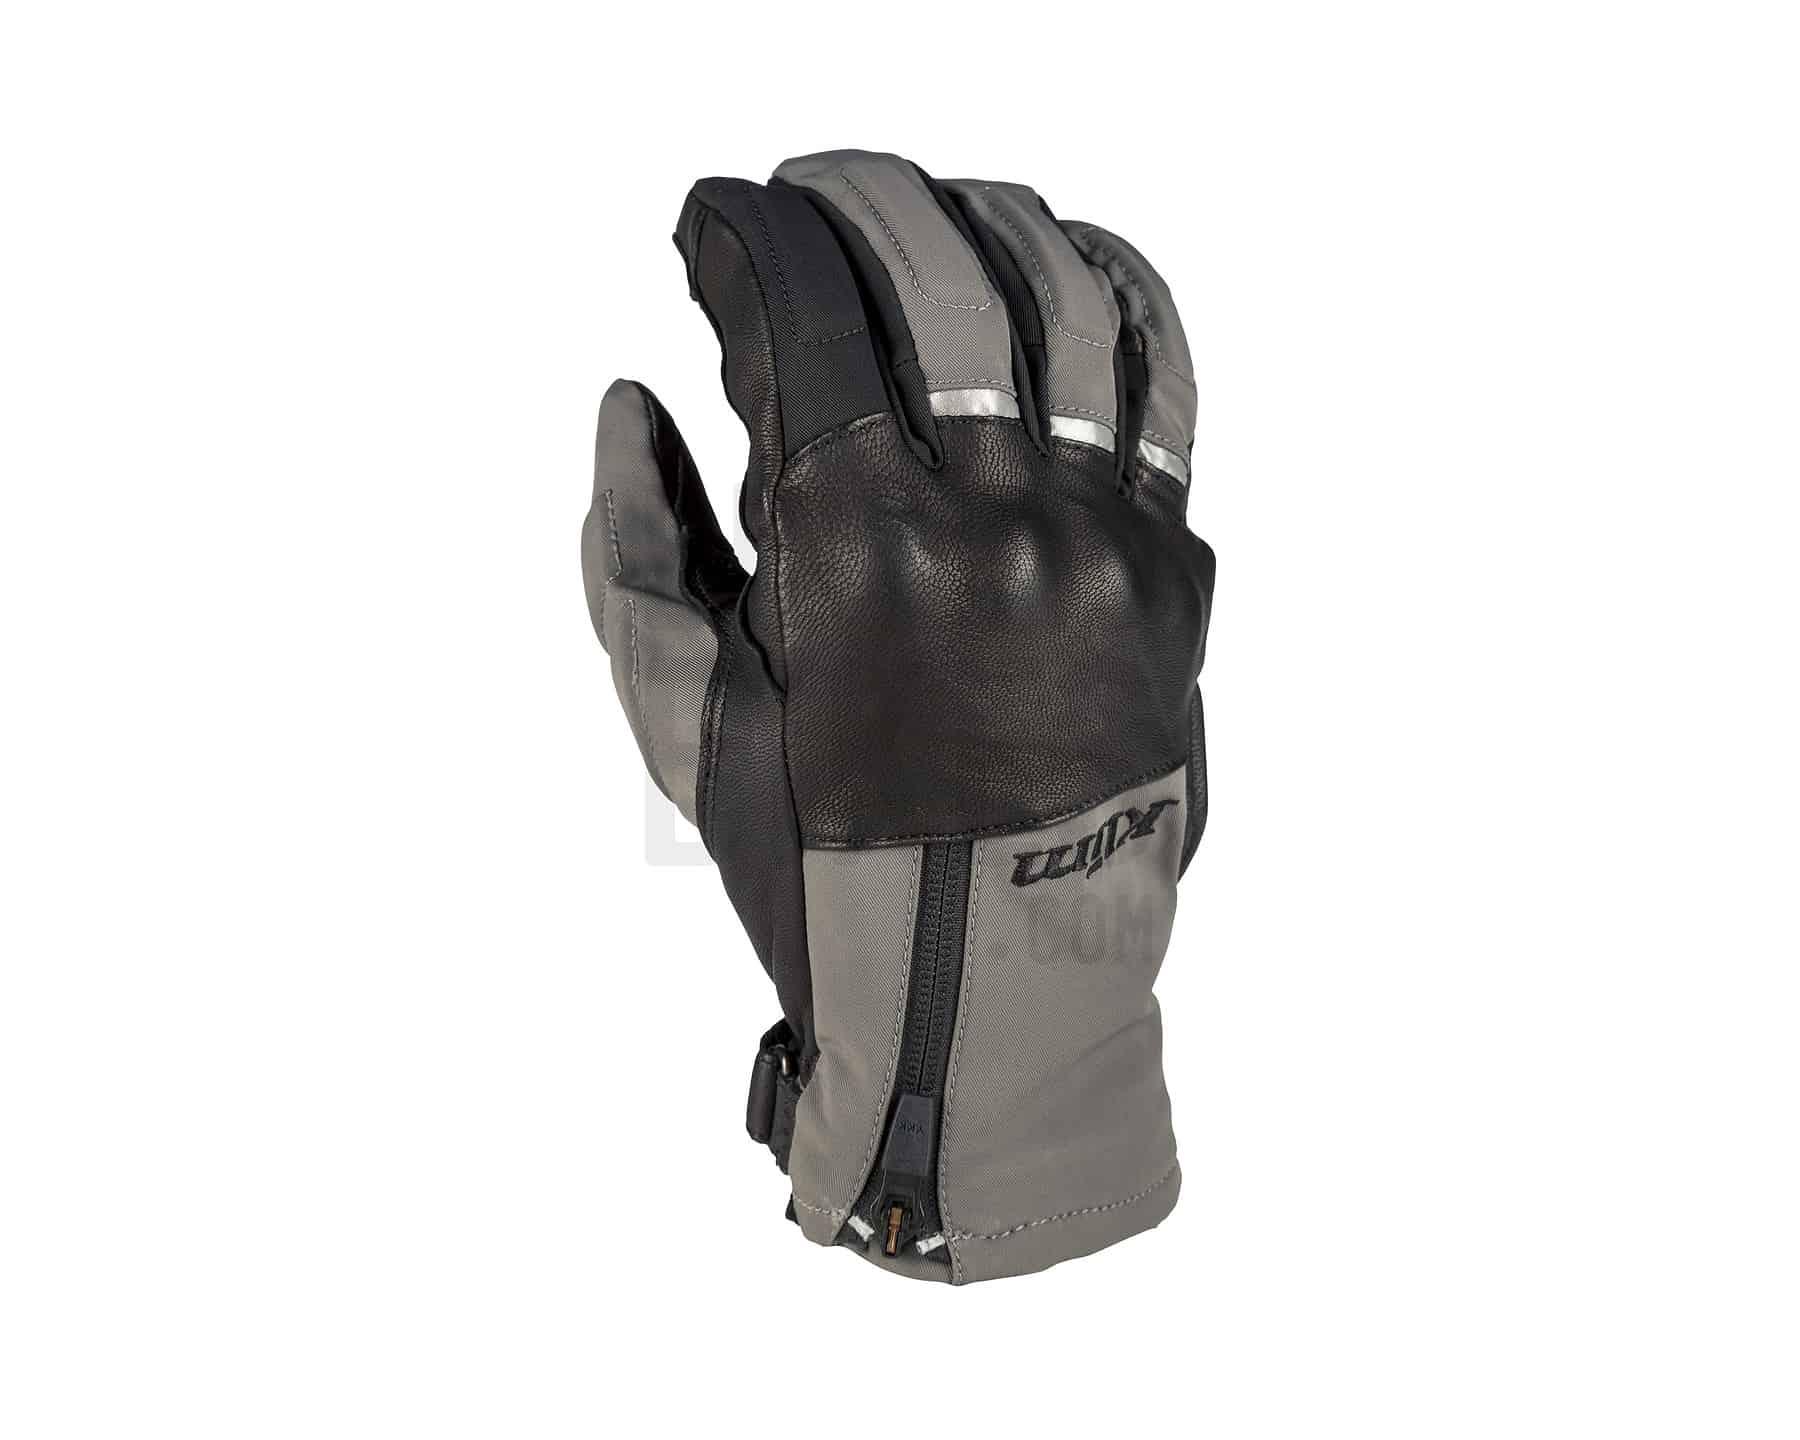 Vanguard GTX Short Glove_3922-000_Gray_01